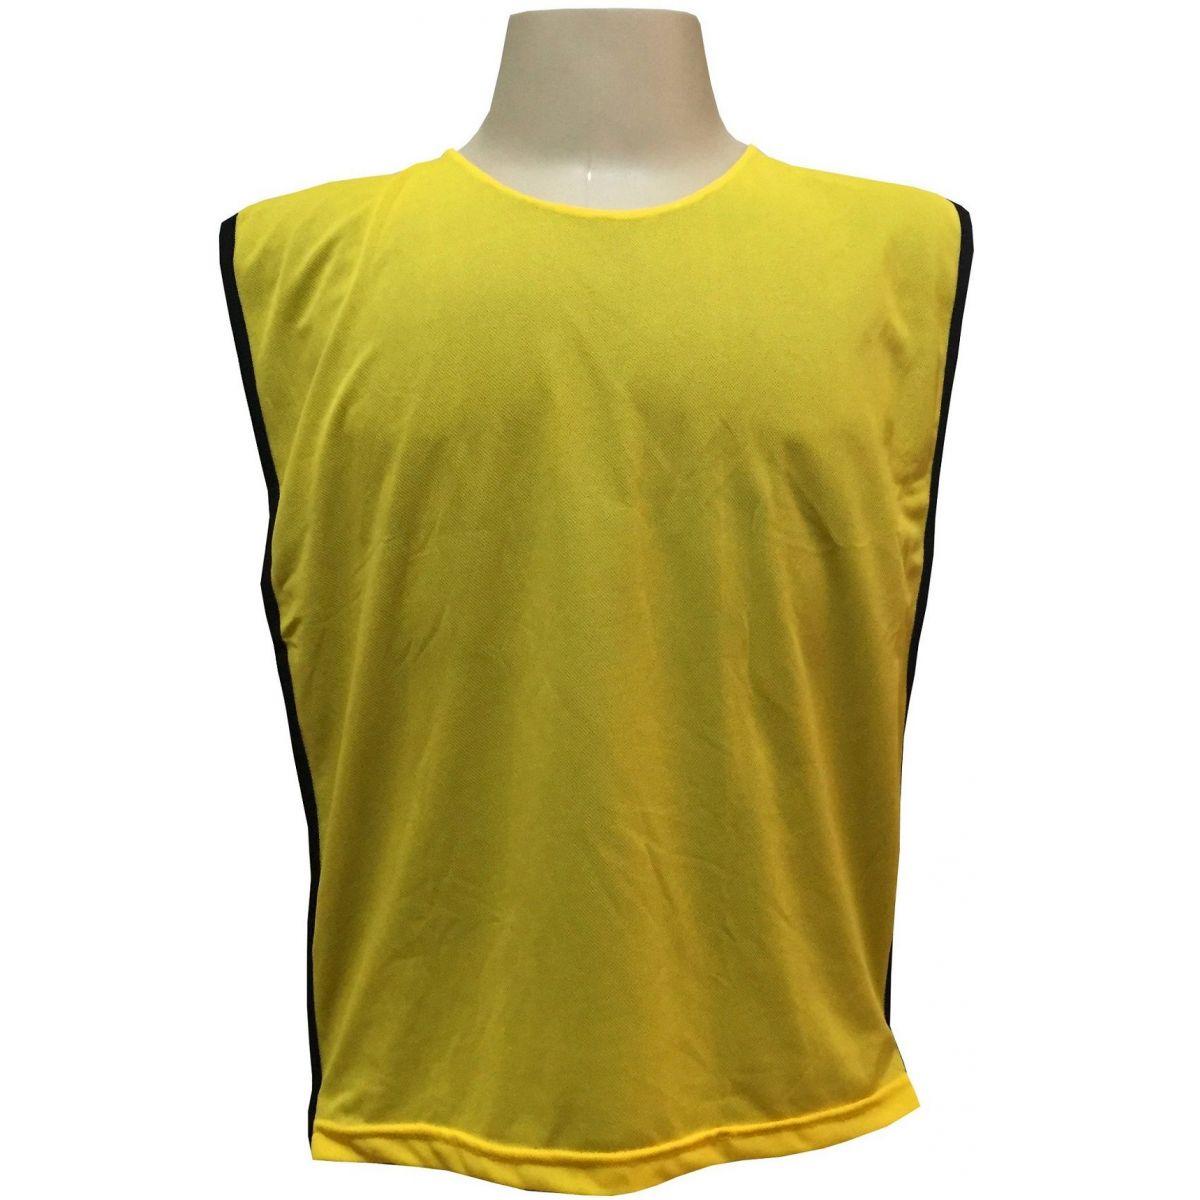 Jogo de Coletes Dupla Face 15 Unidades na cor Amarelo/Preto